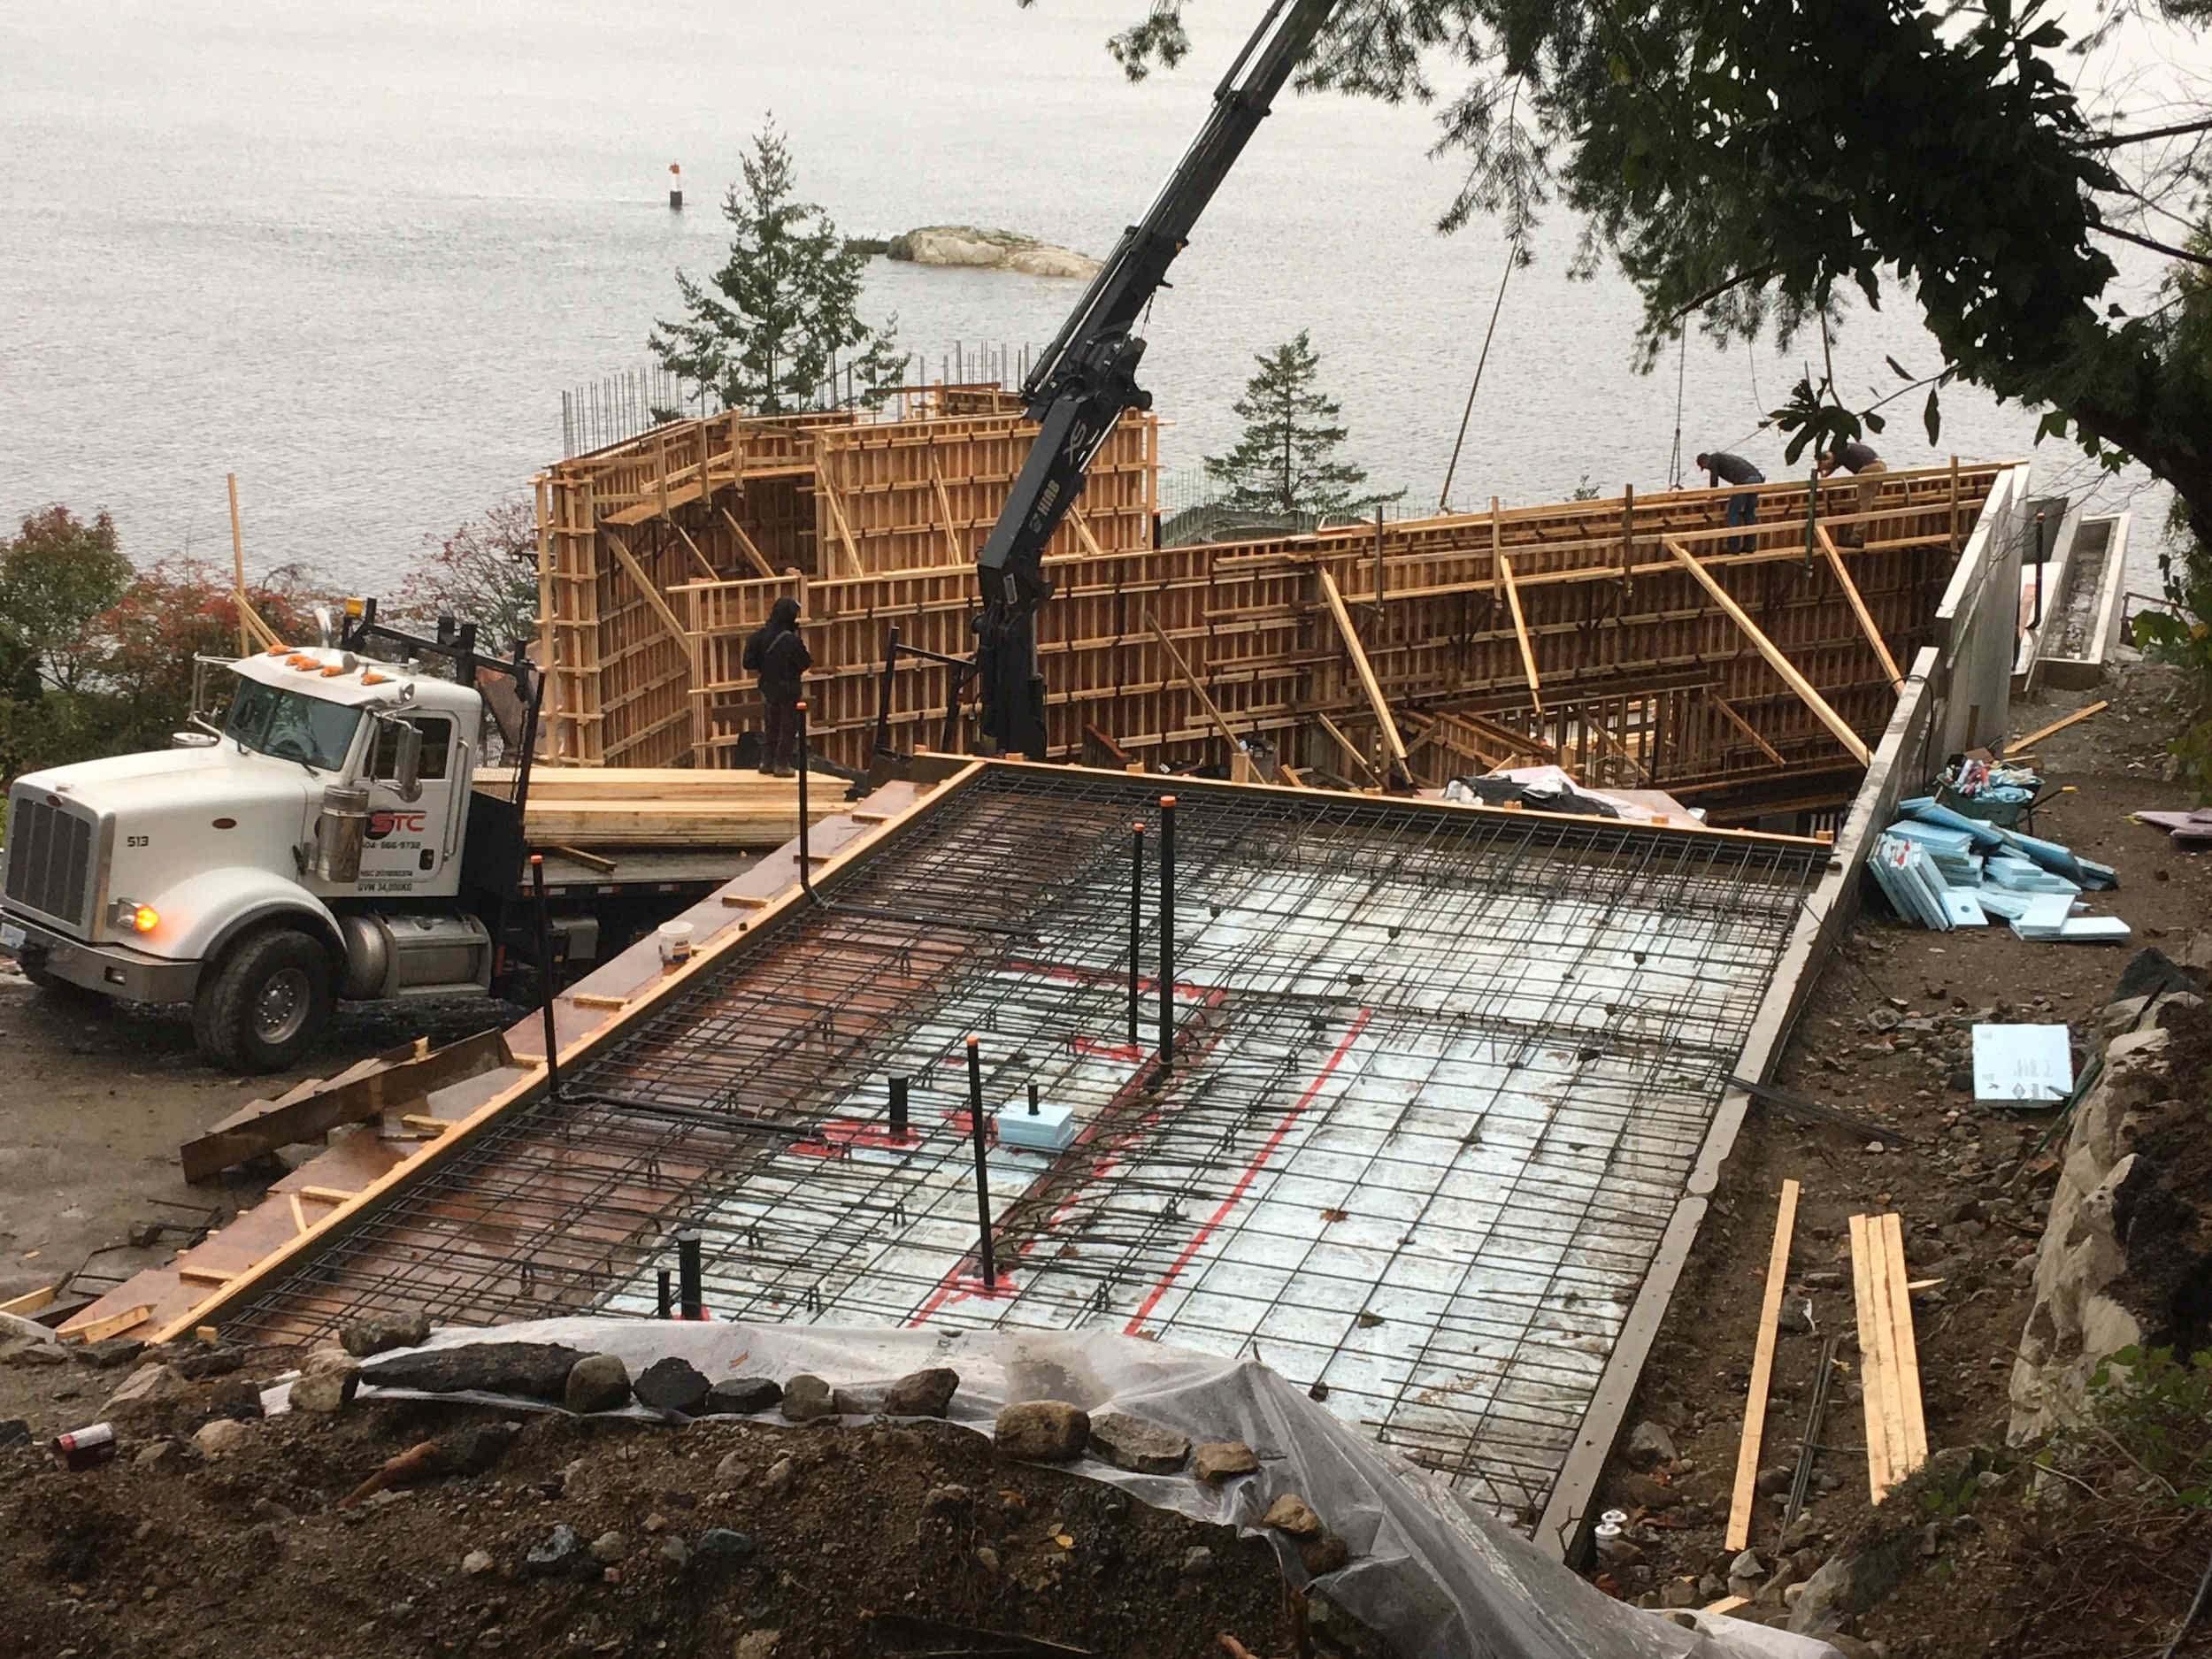 Postle_Construction_ConcreteForming20.jpg